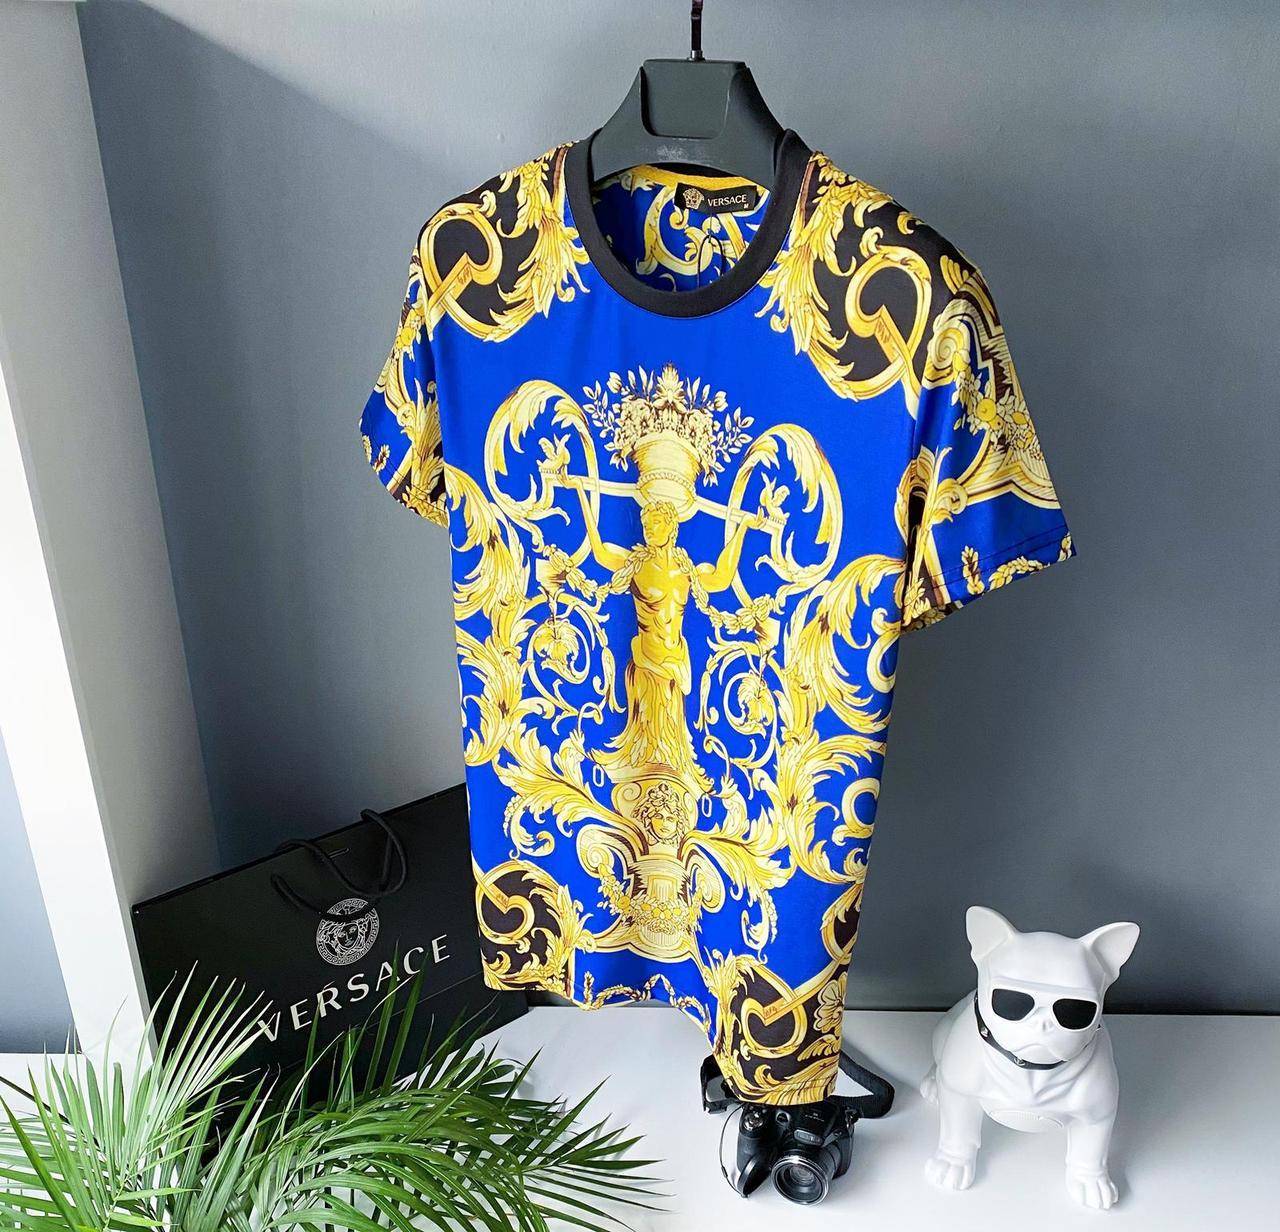 Яскрава Футболка версаче versace річна синього кольору синя футболка чоловіча футболка